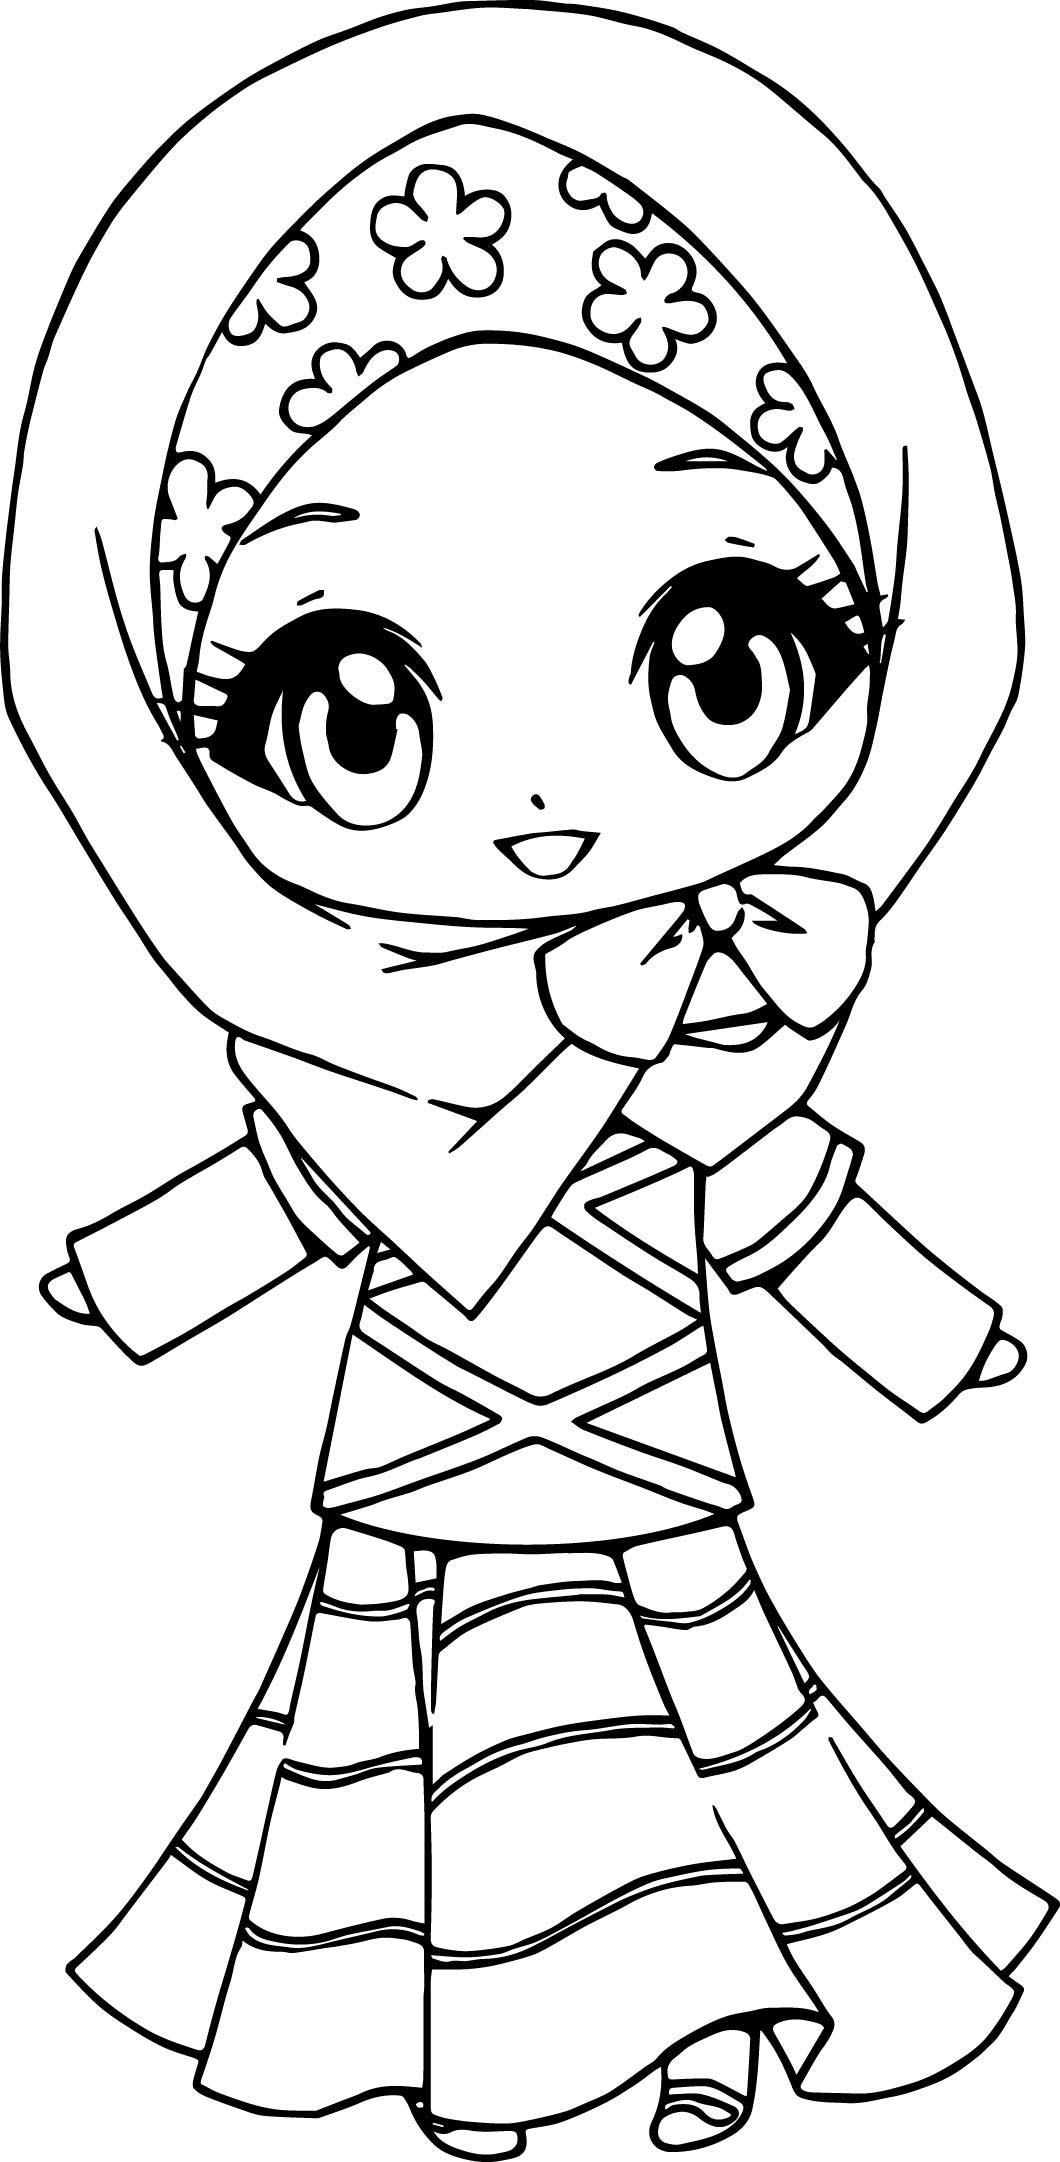 Muslim Girl Drawing at GetDrawings.com | Free for personal use ...